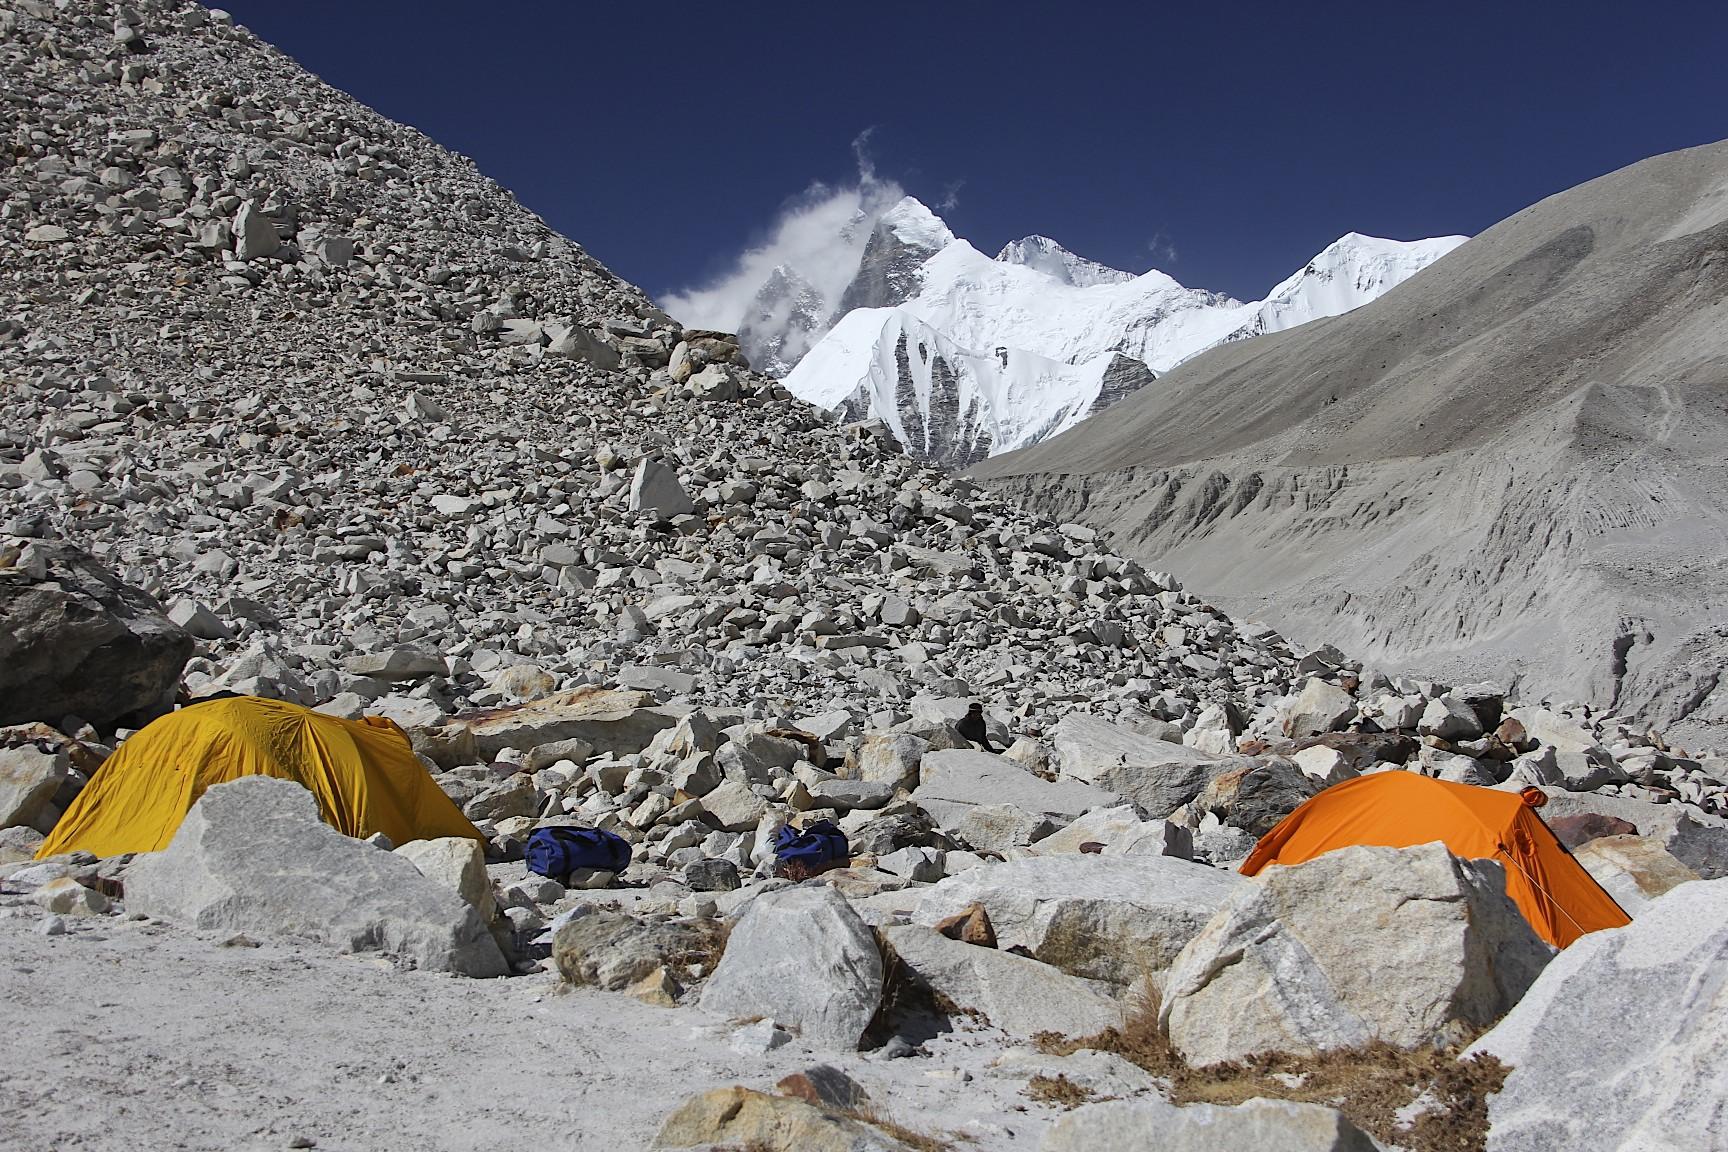 Sandy camp en route to Sherpani Col